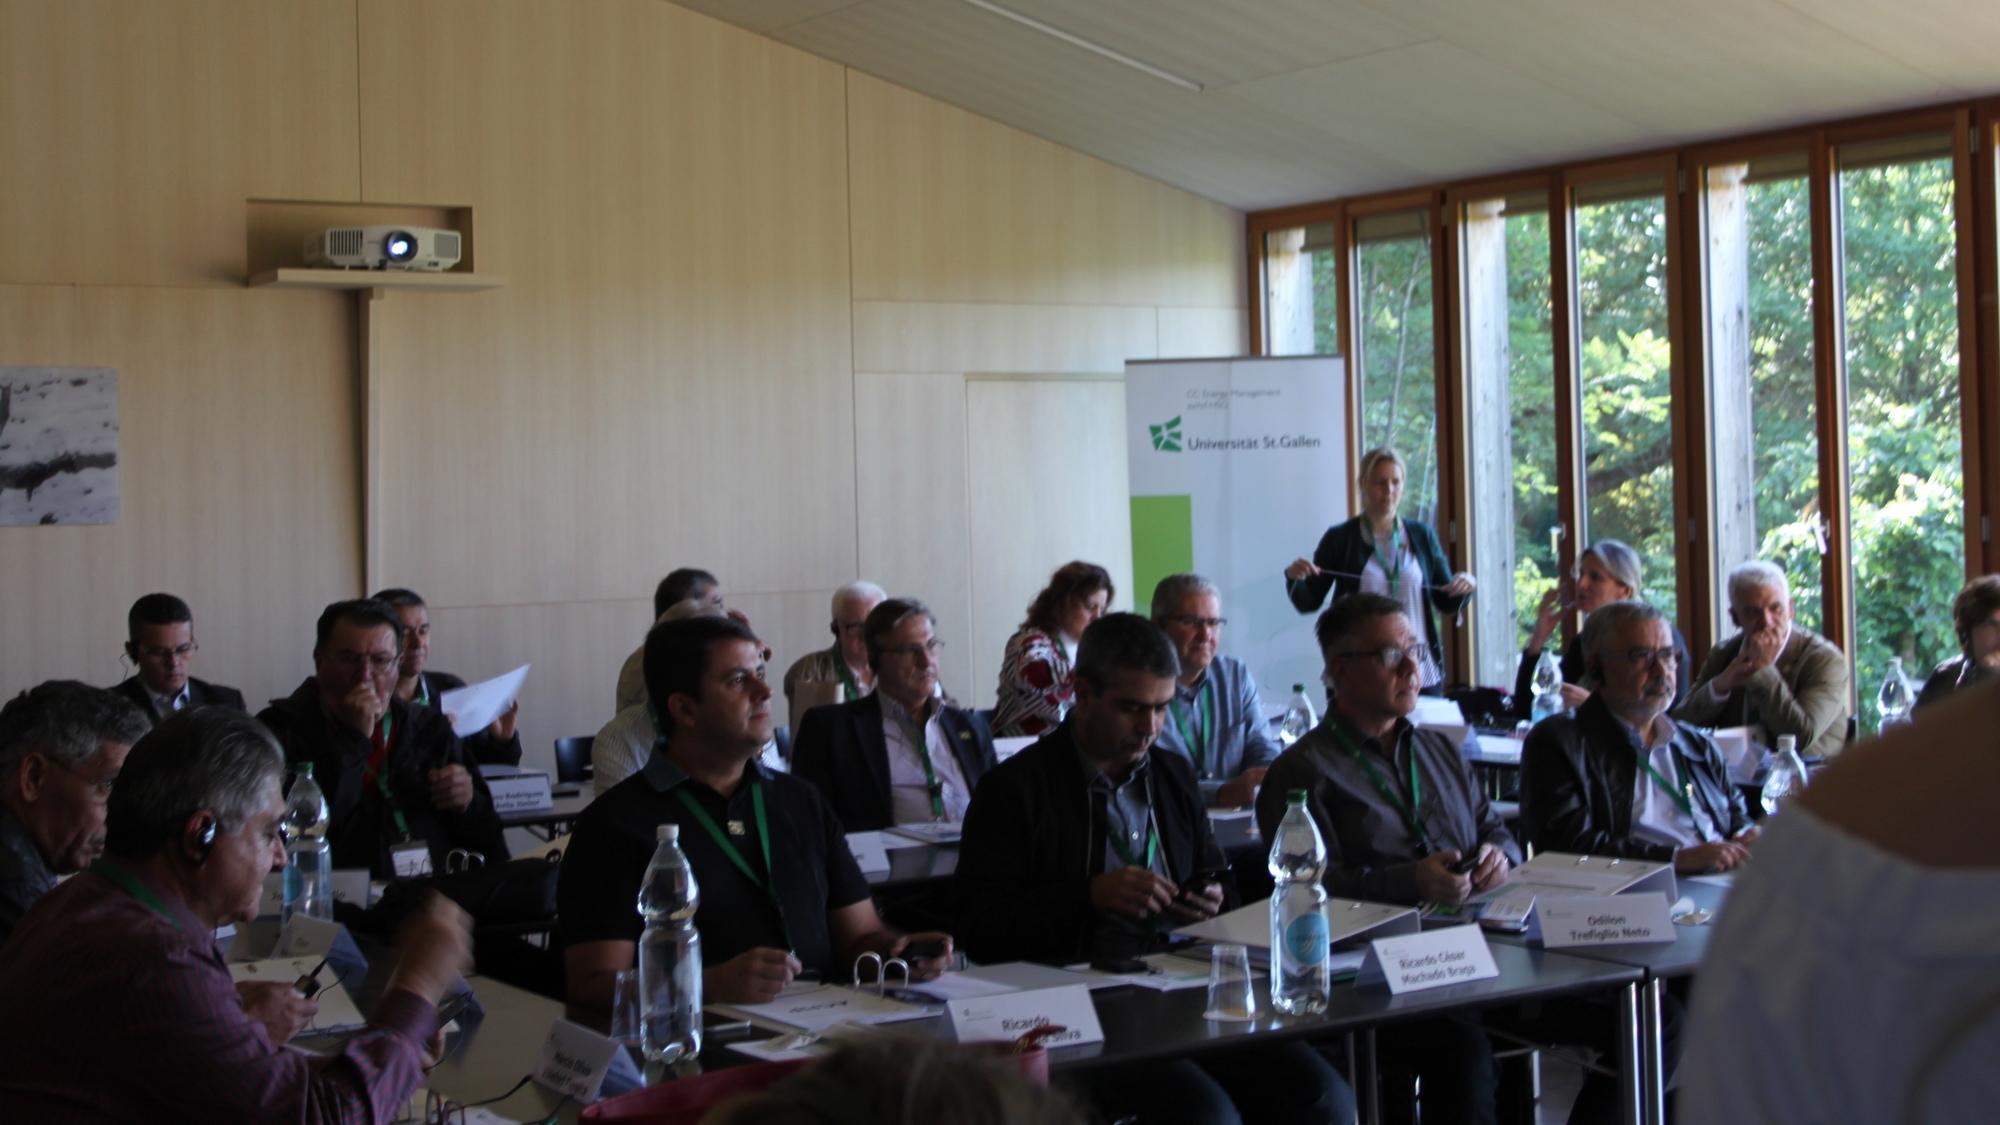 Coop Executive Course St Gallen